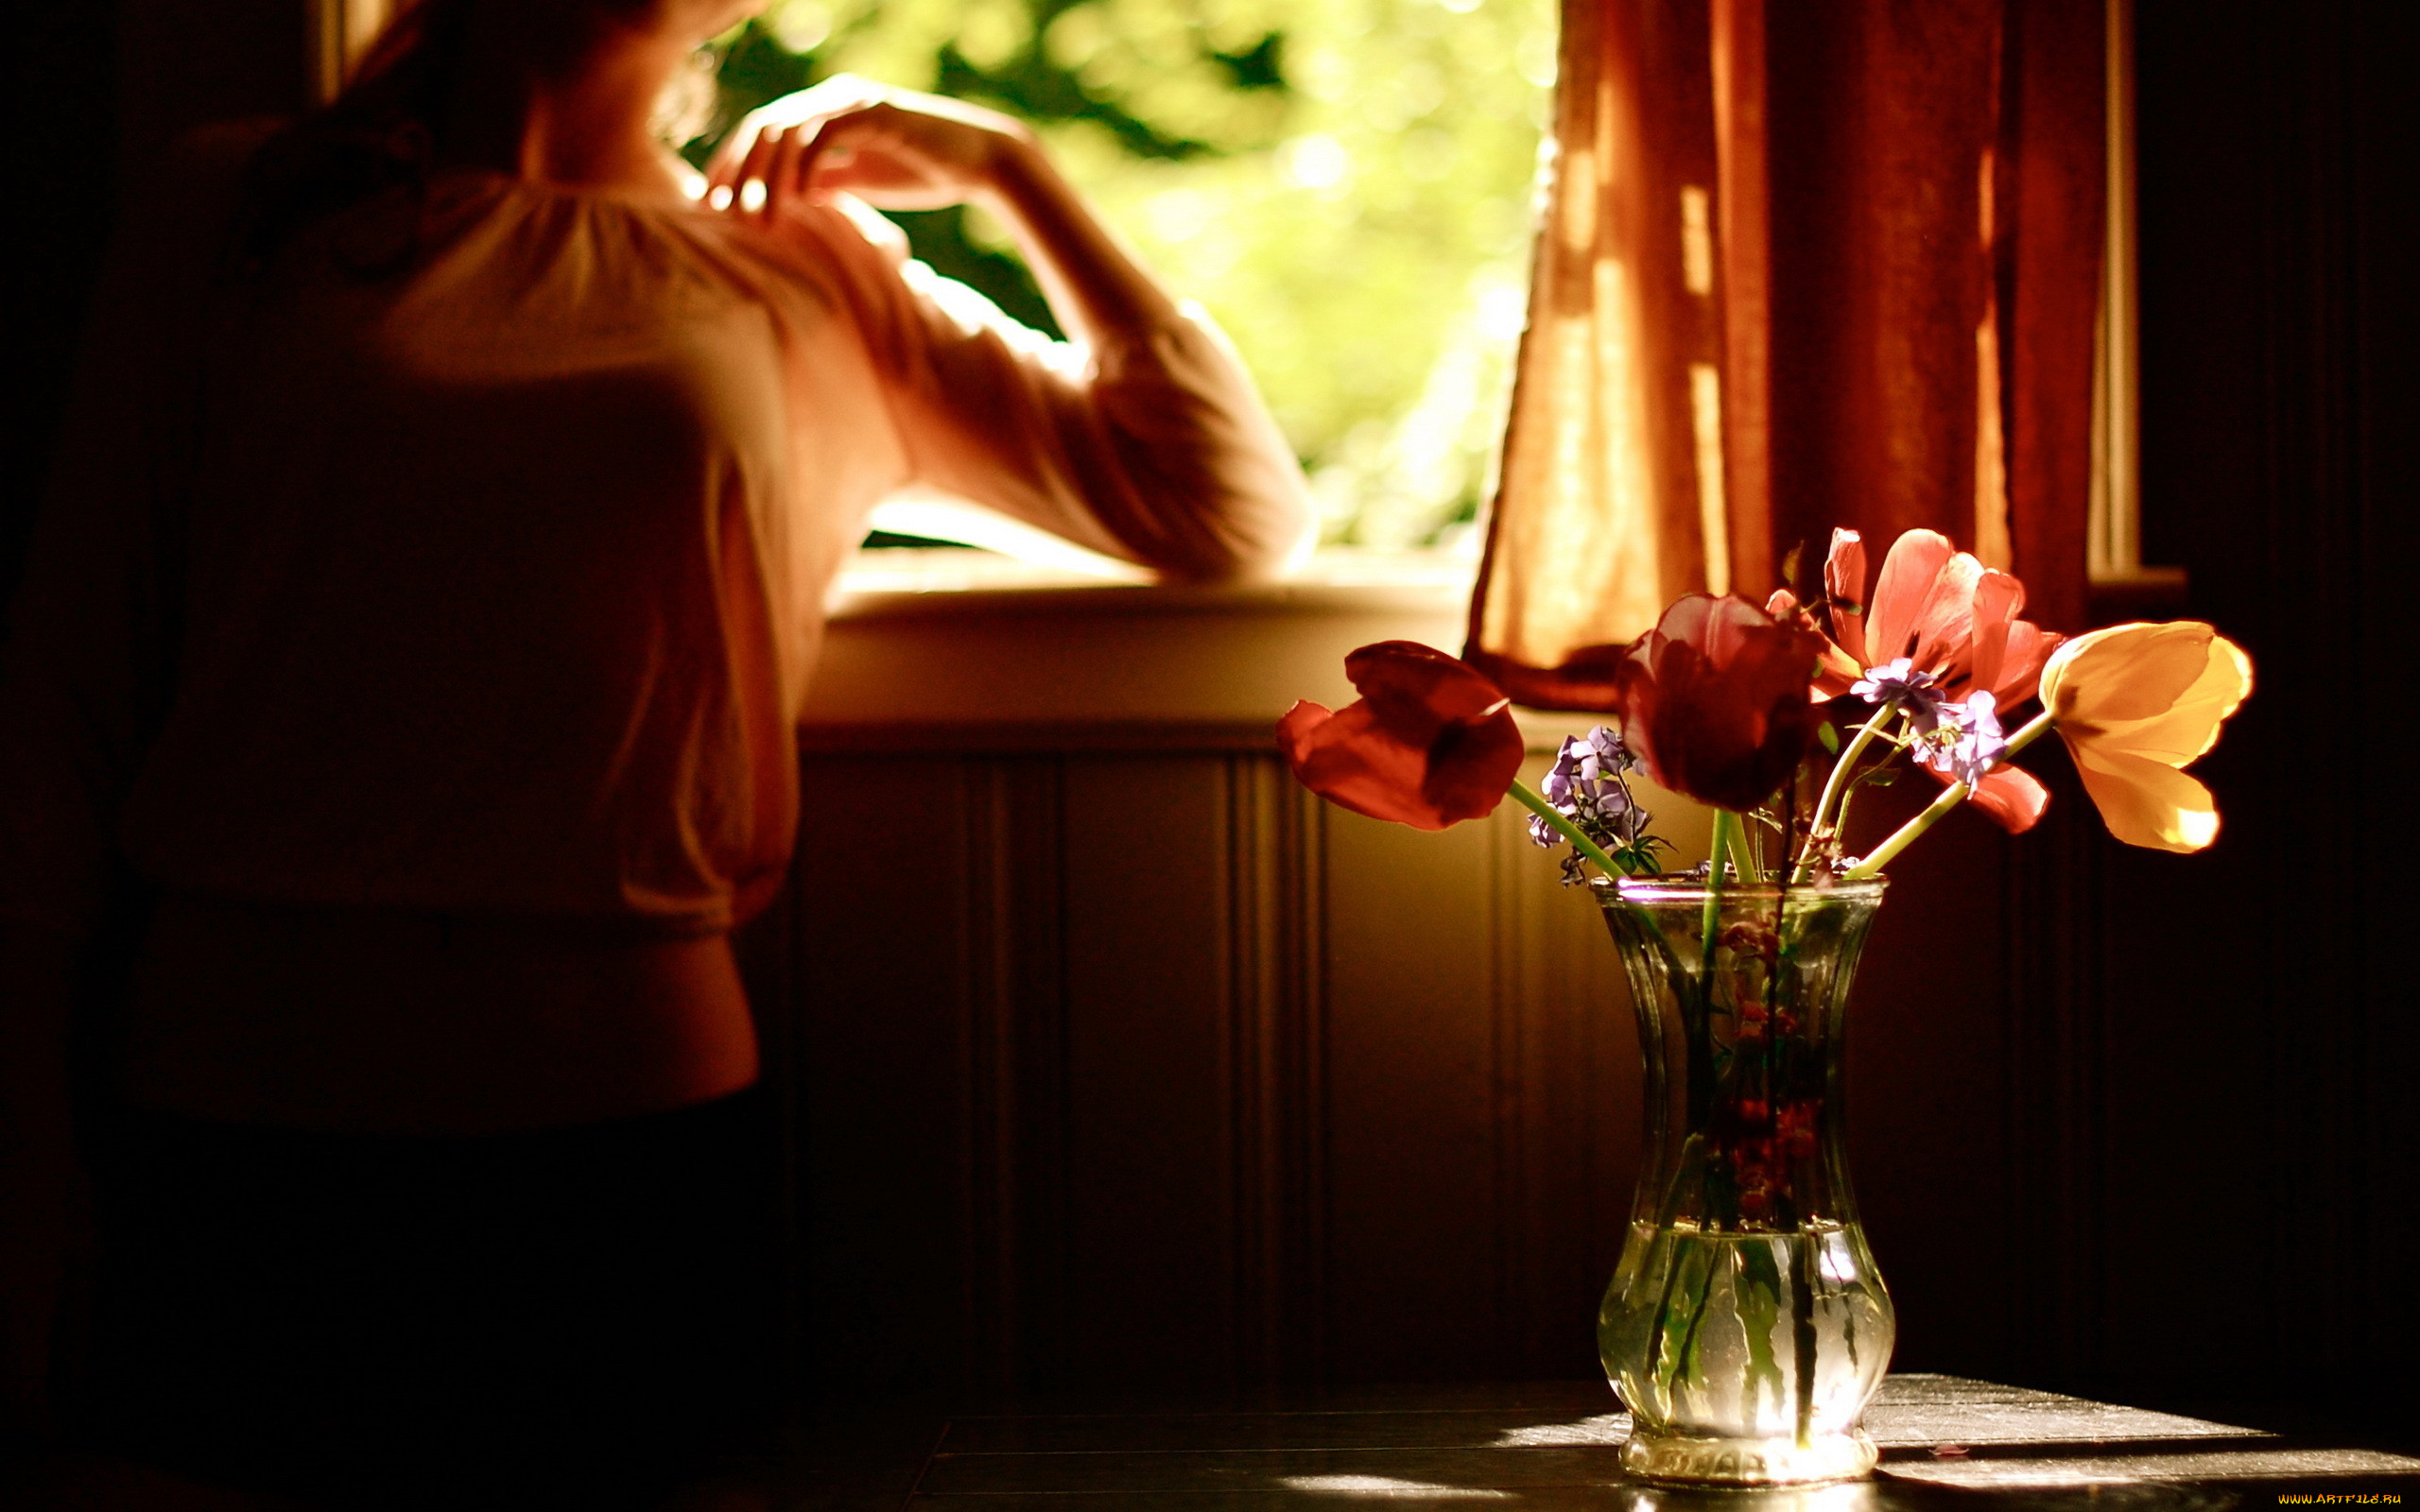 Цветы на окне вечером фото